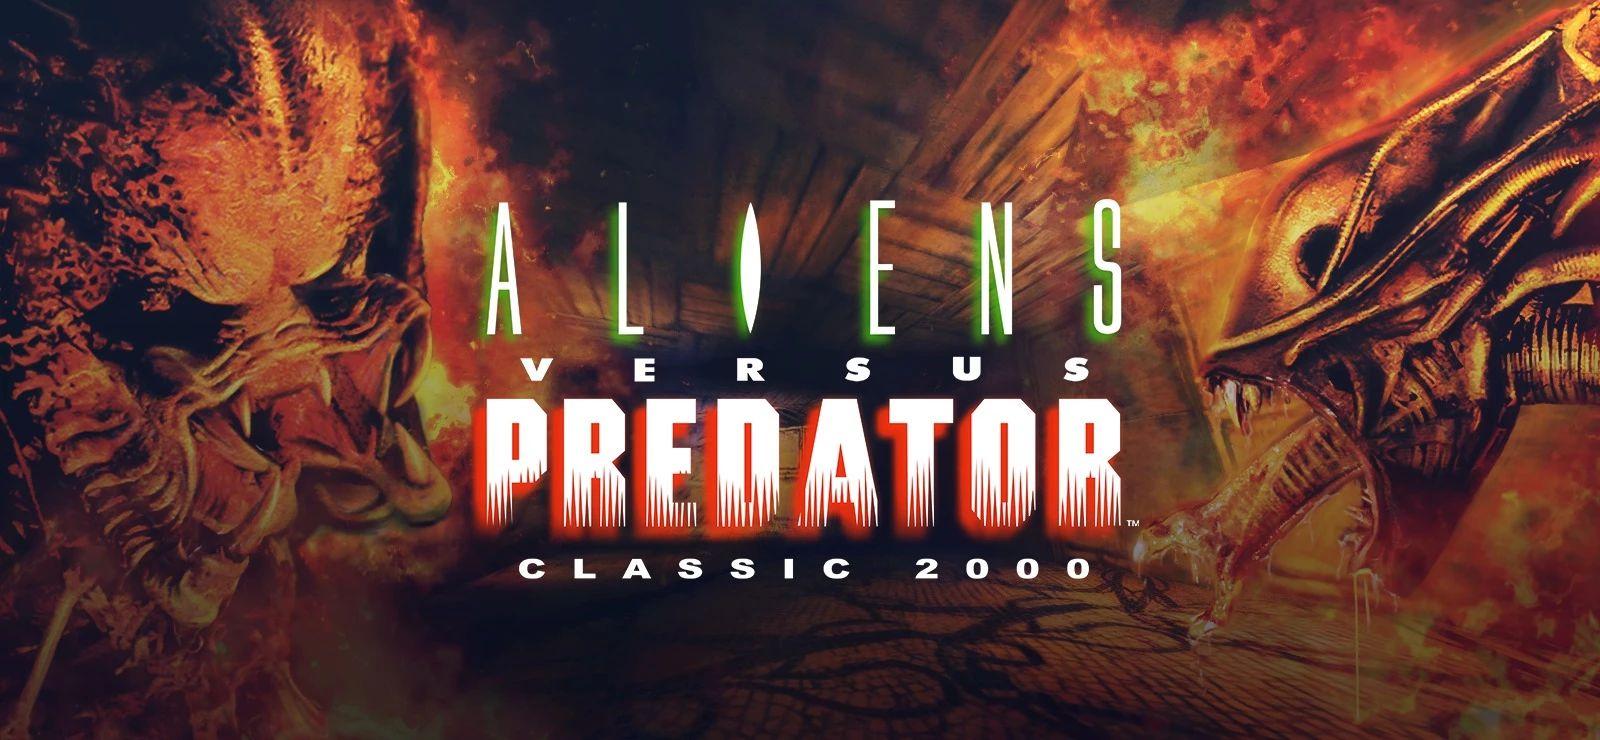 [Steam] Alien vs Predator Classic 2000 (PC) - 88p @ Green Man Gaming